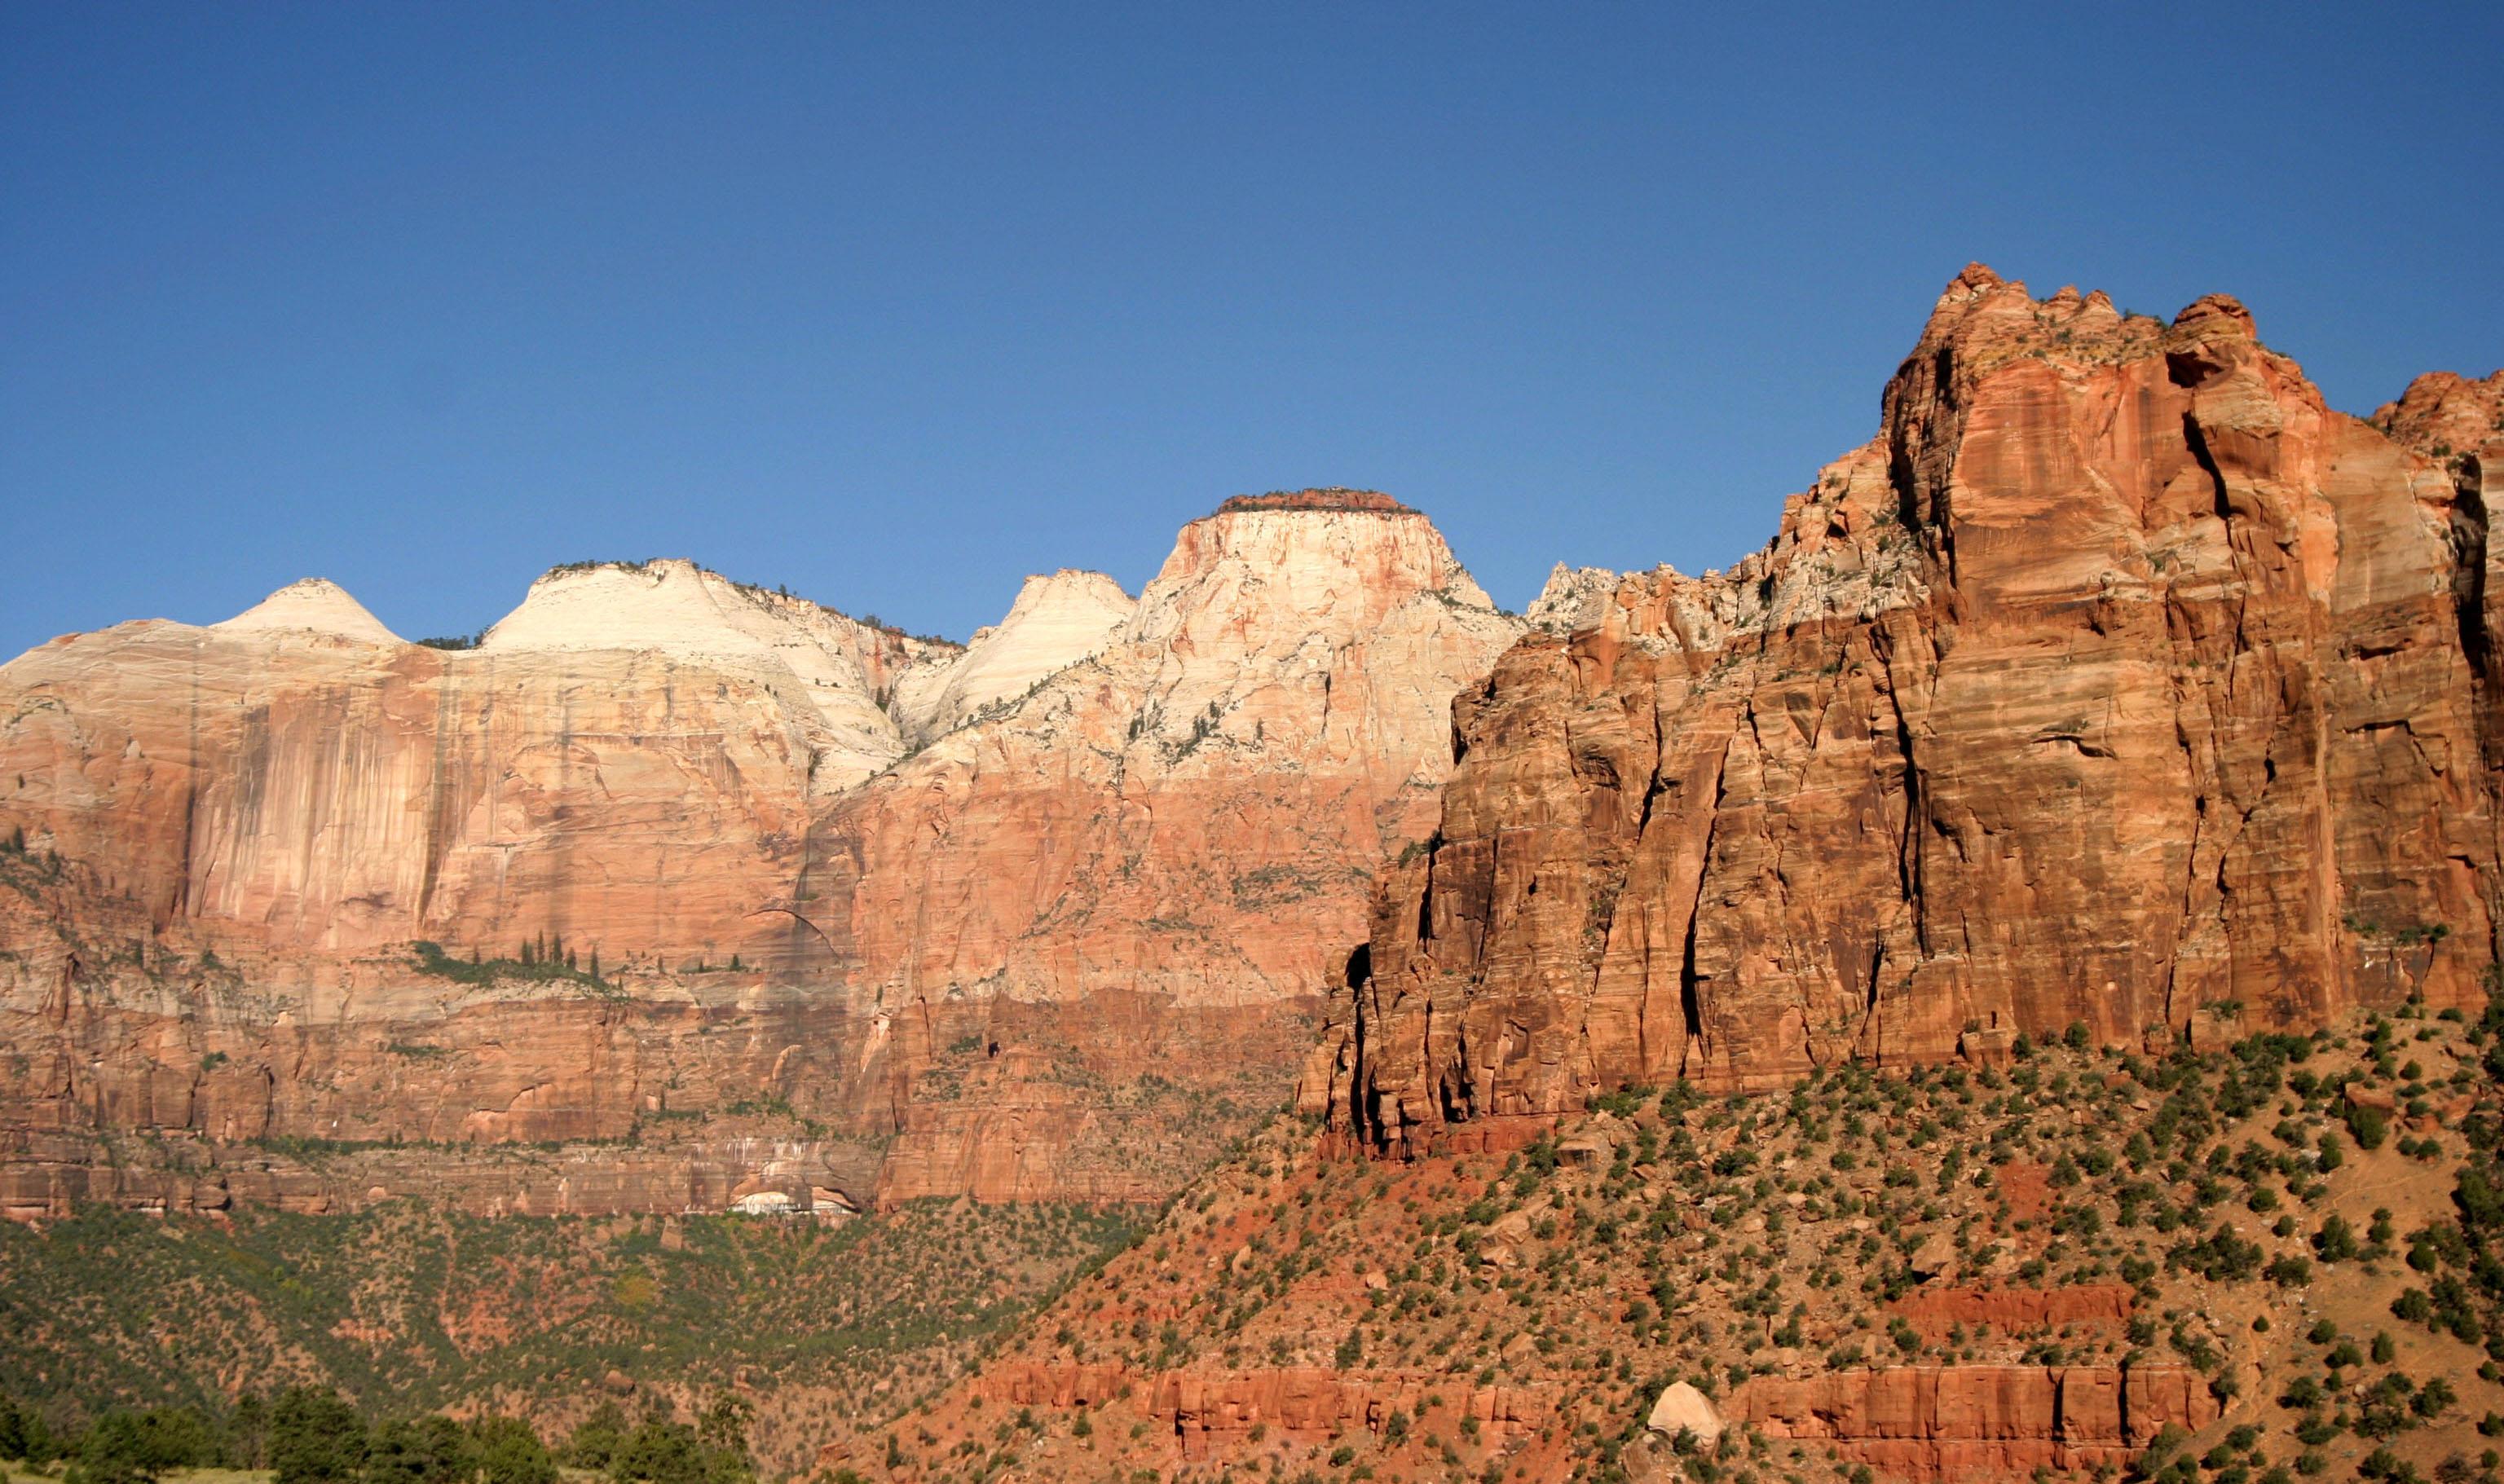 IMG_9128 ac.jpg: Zion National Park